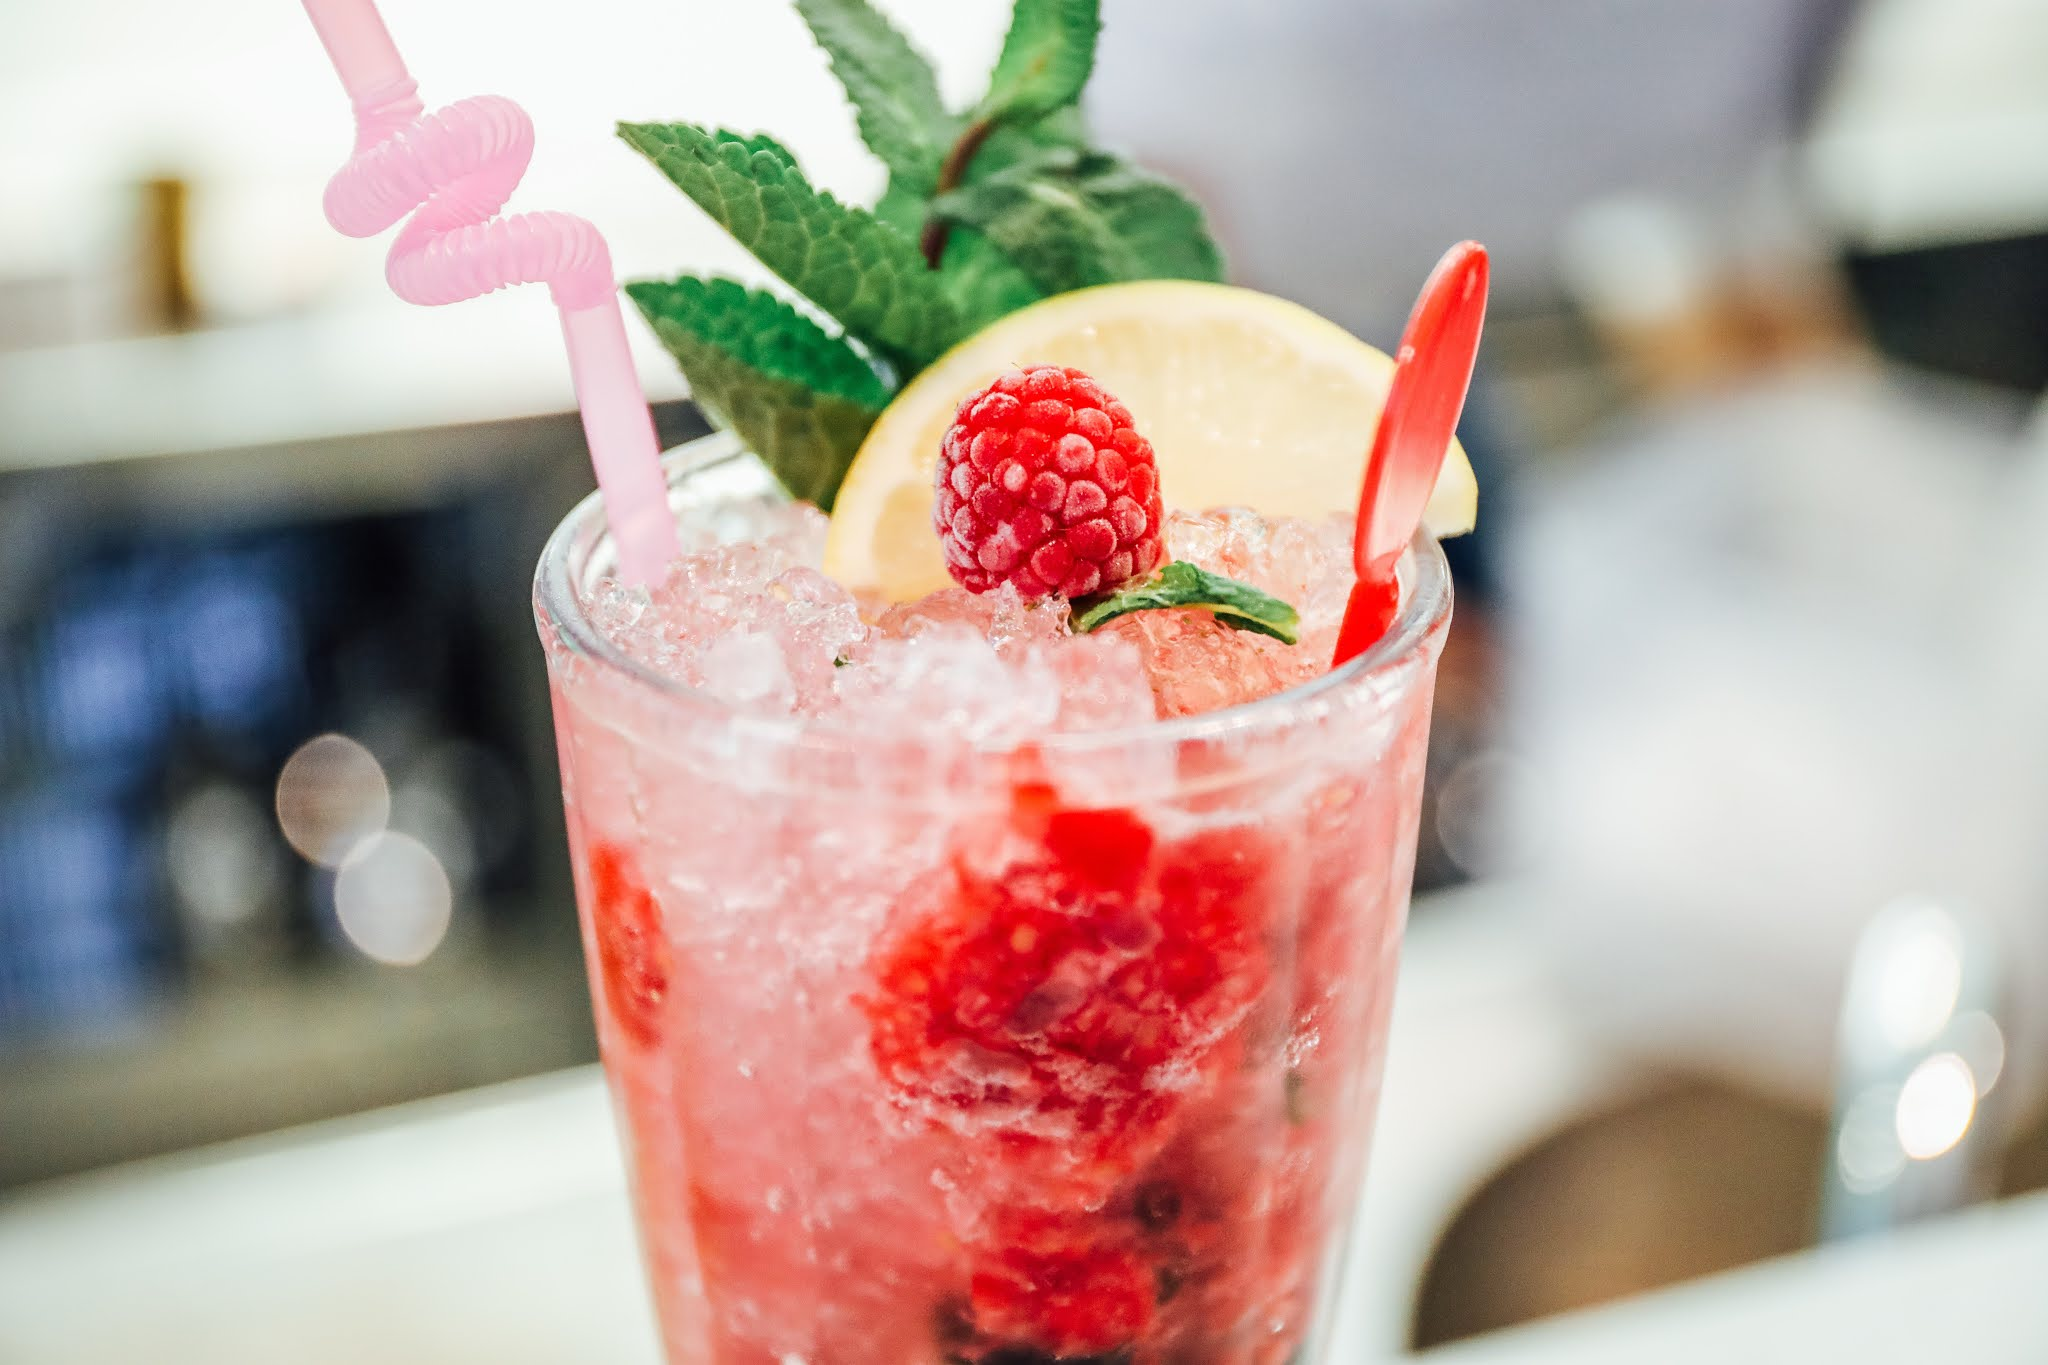 Method of action of raspberry-Shamy juice